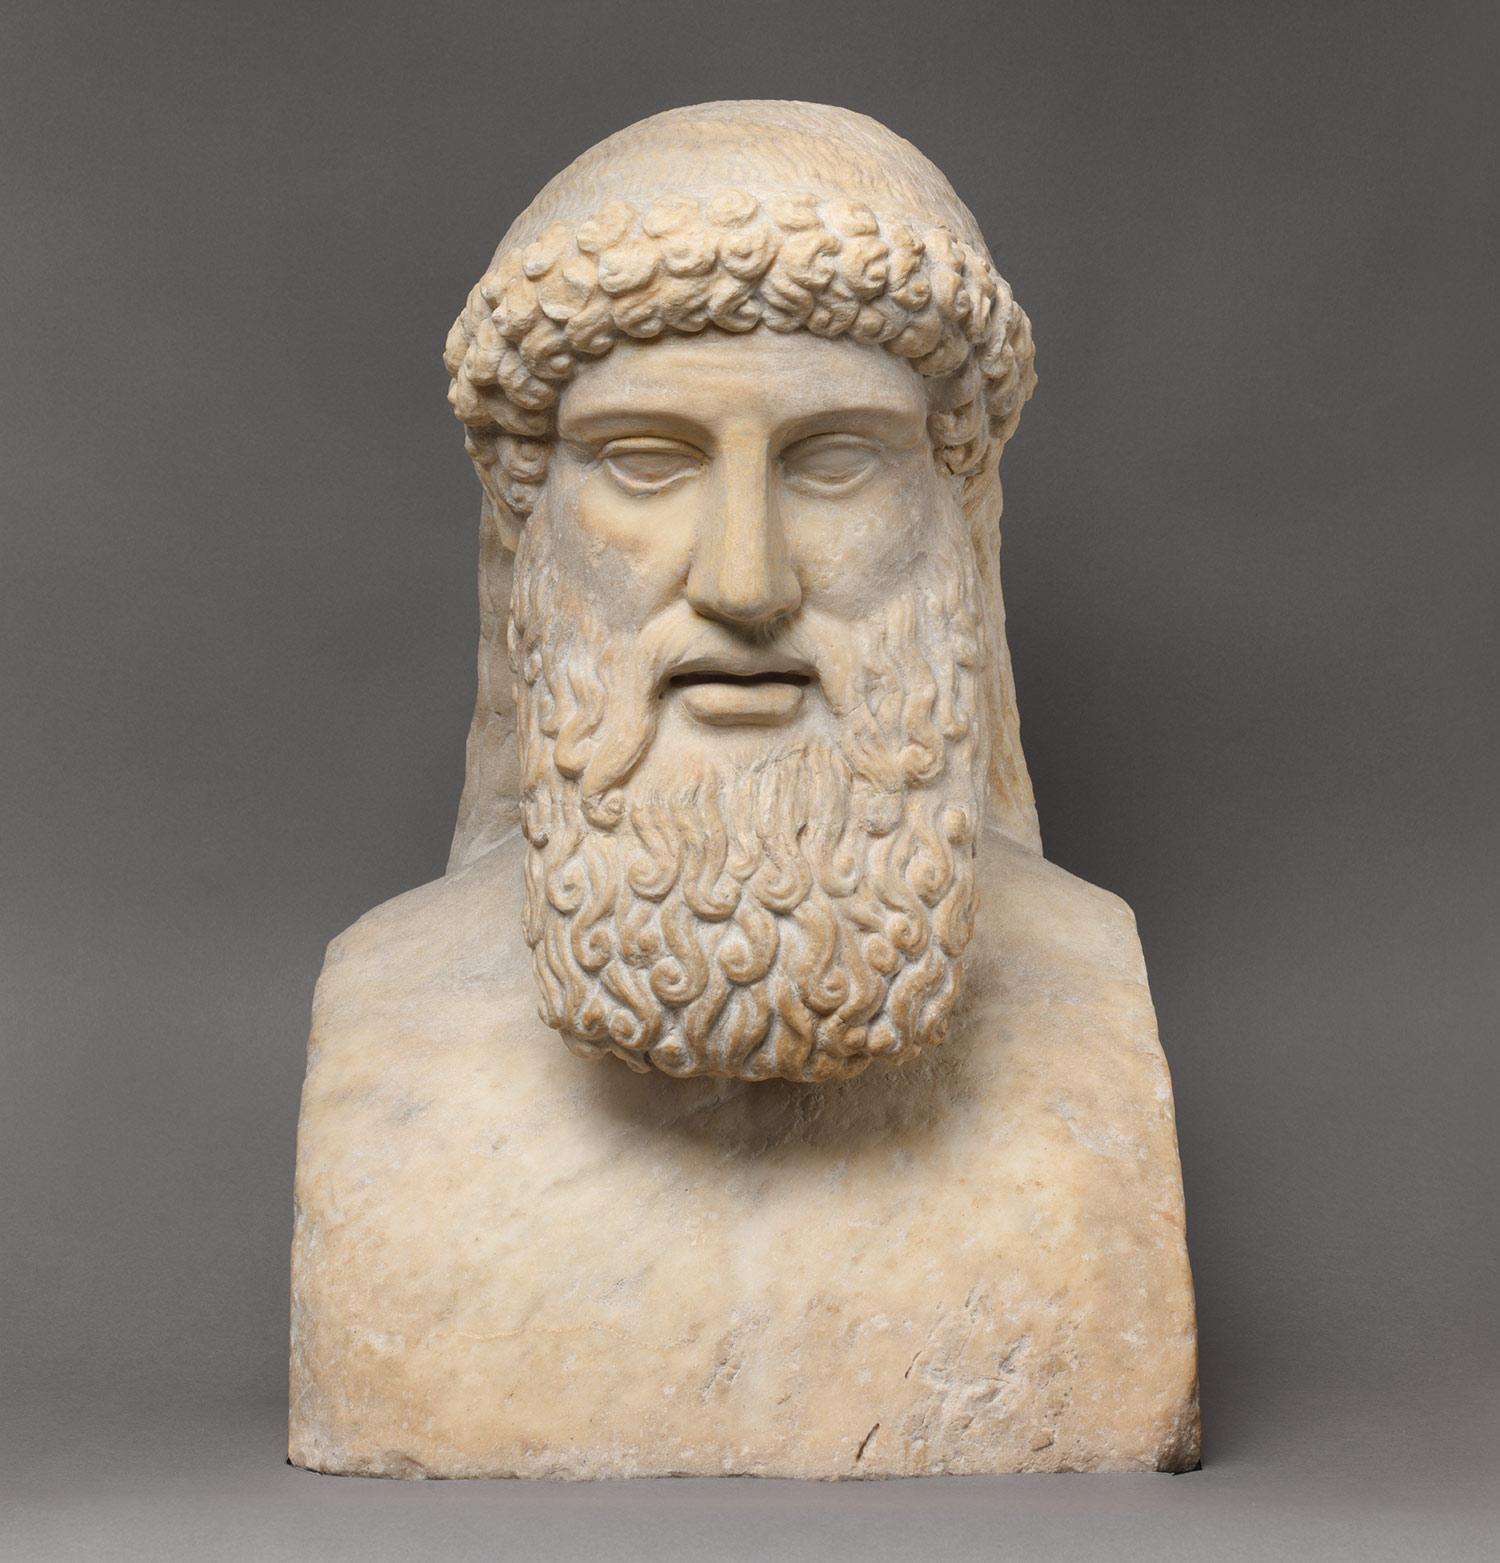 Retrospective Styles In Greek And Roman Sculpture